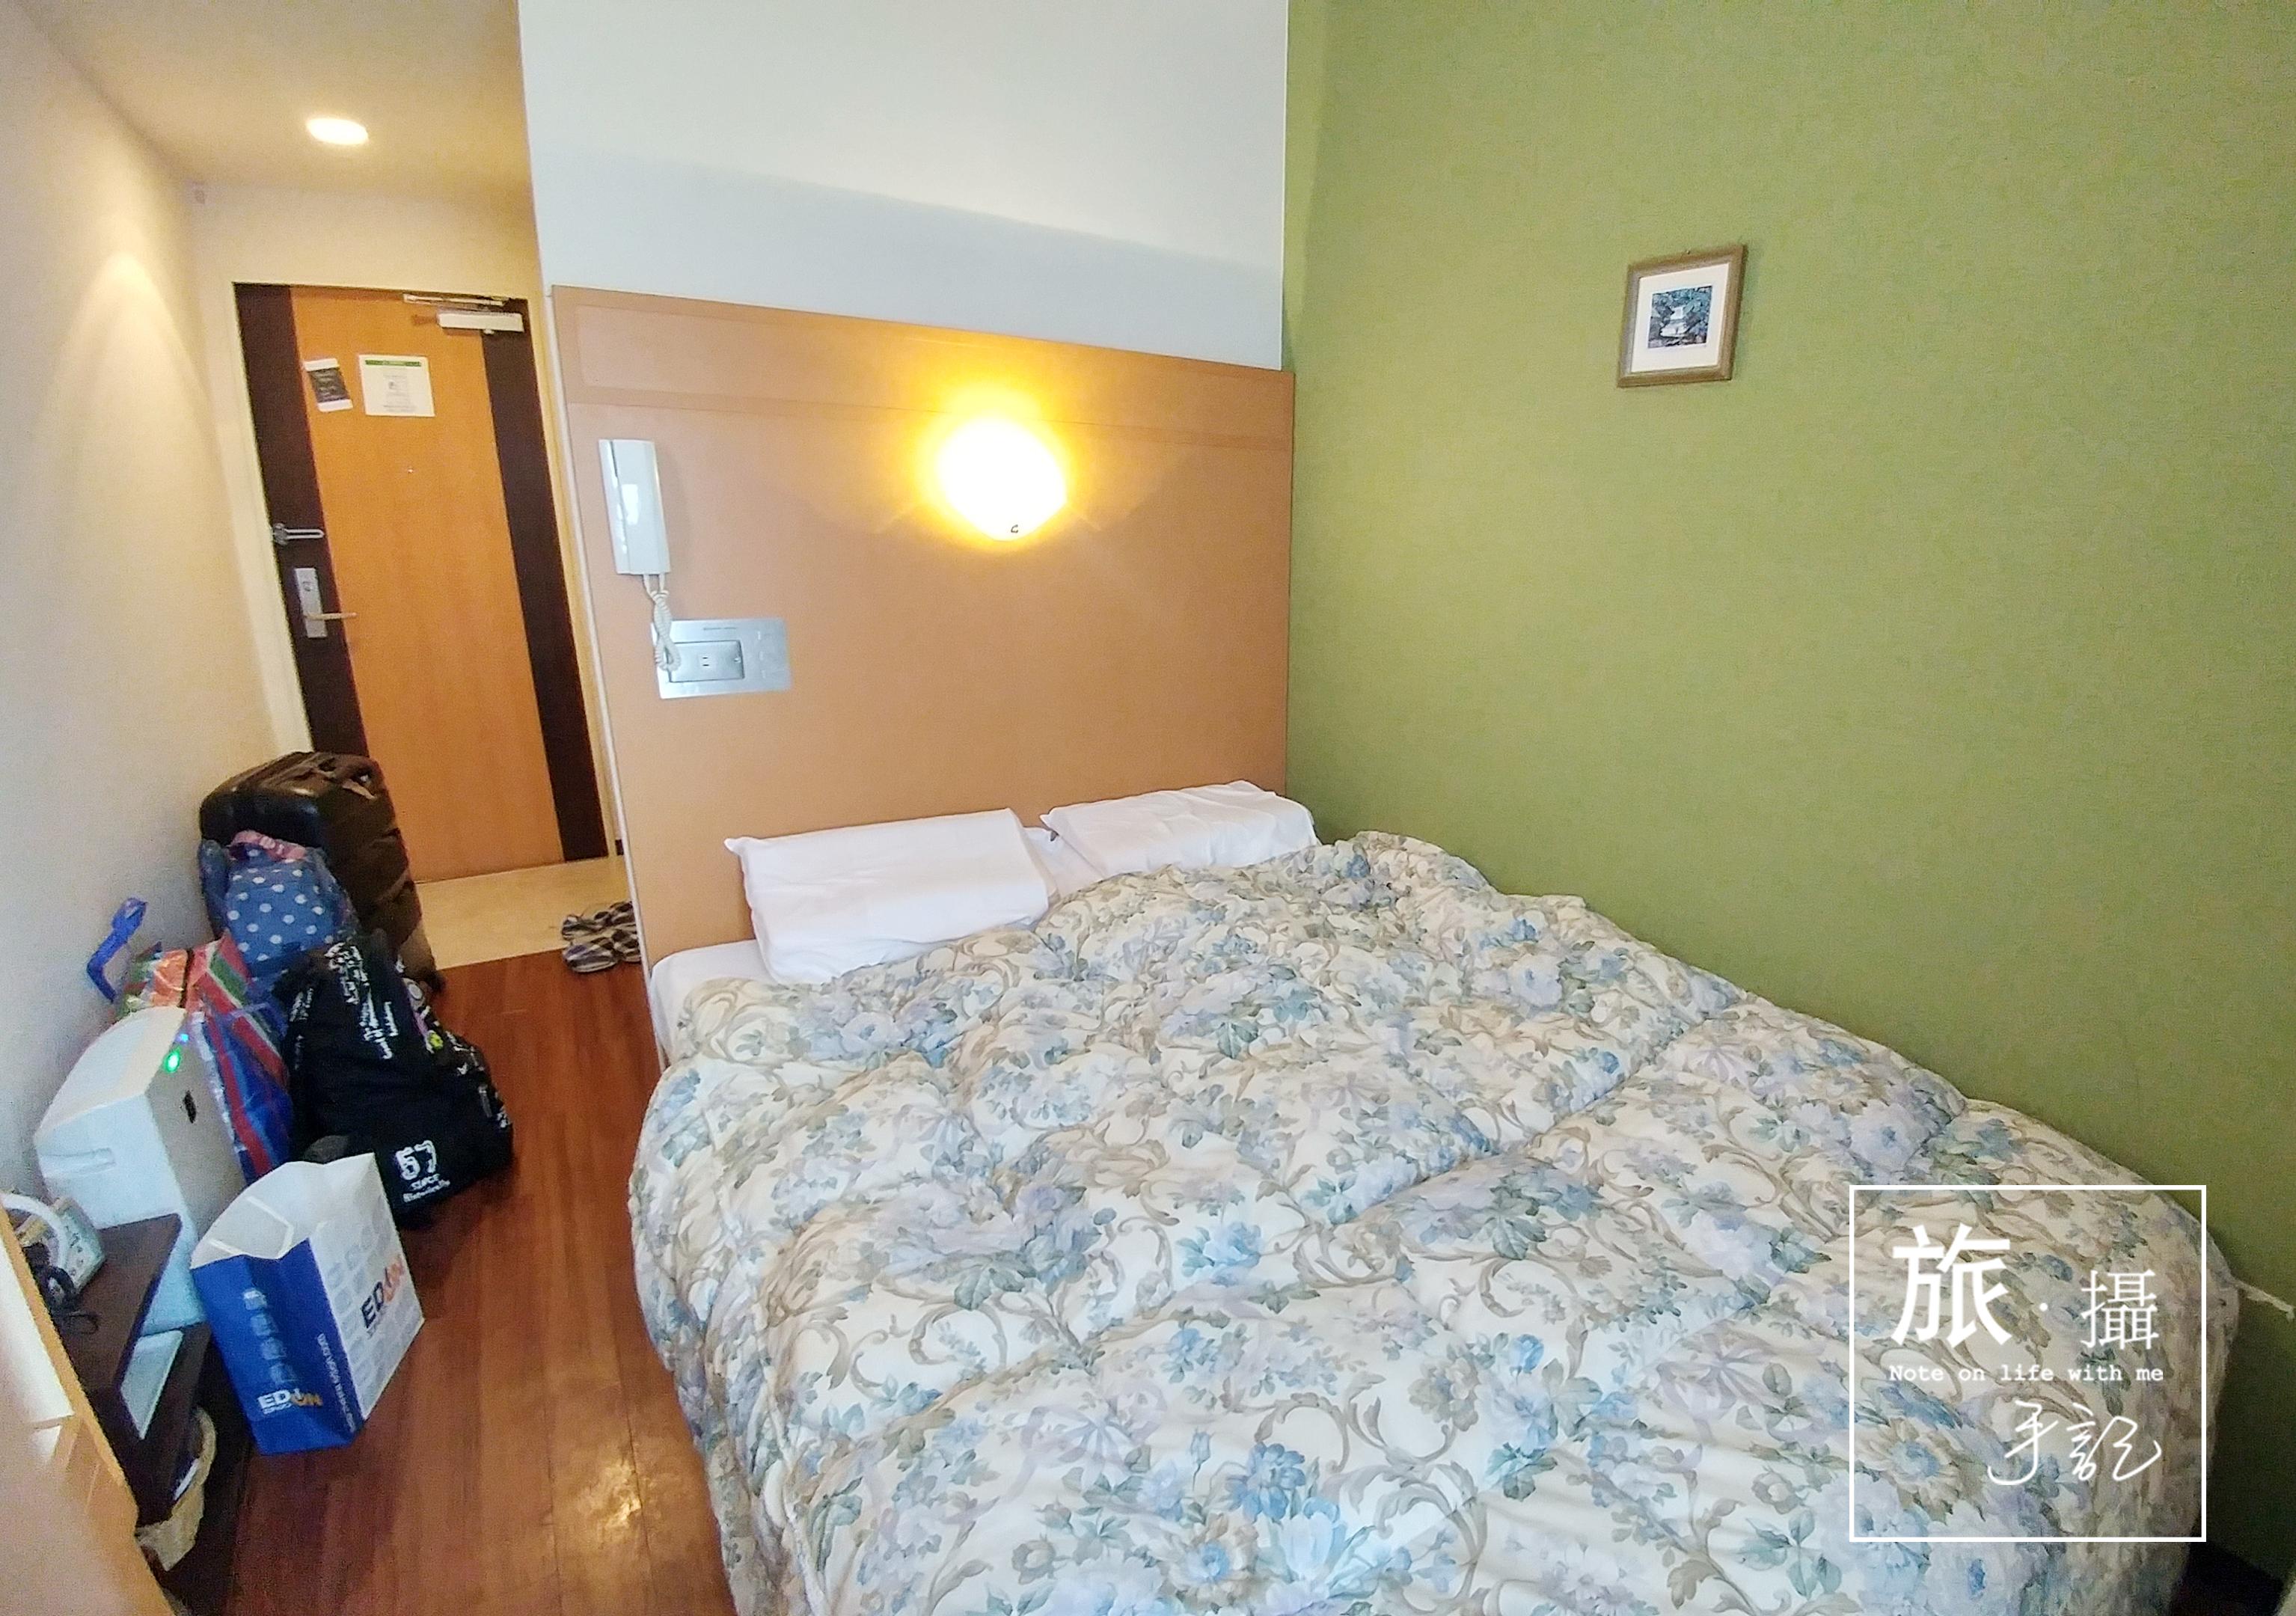 Ishigaki Okinawa Super Hotel 石垣 沖繩 酒店